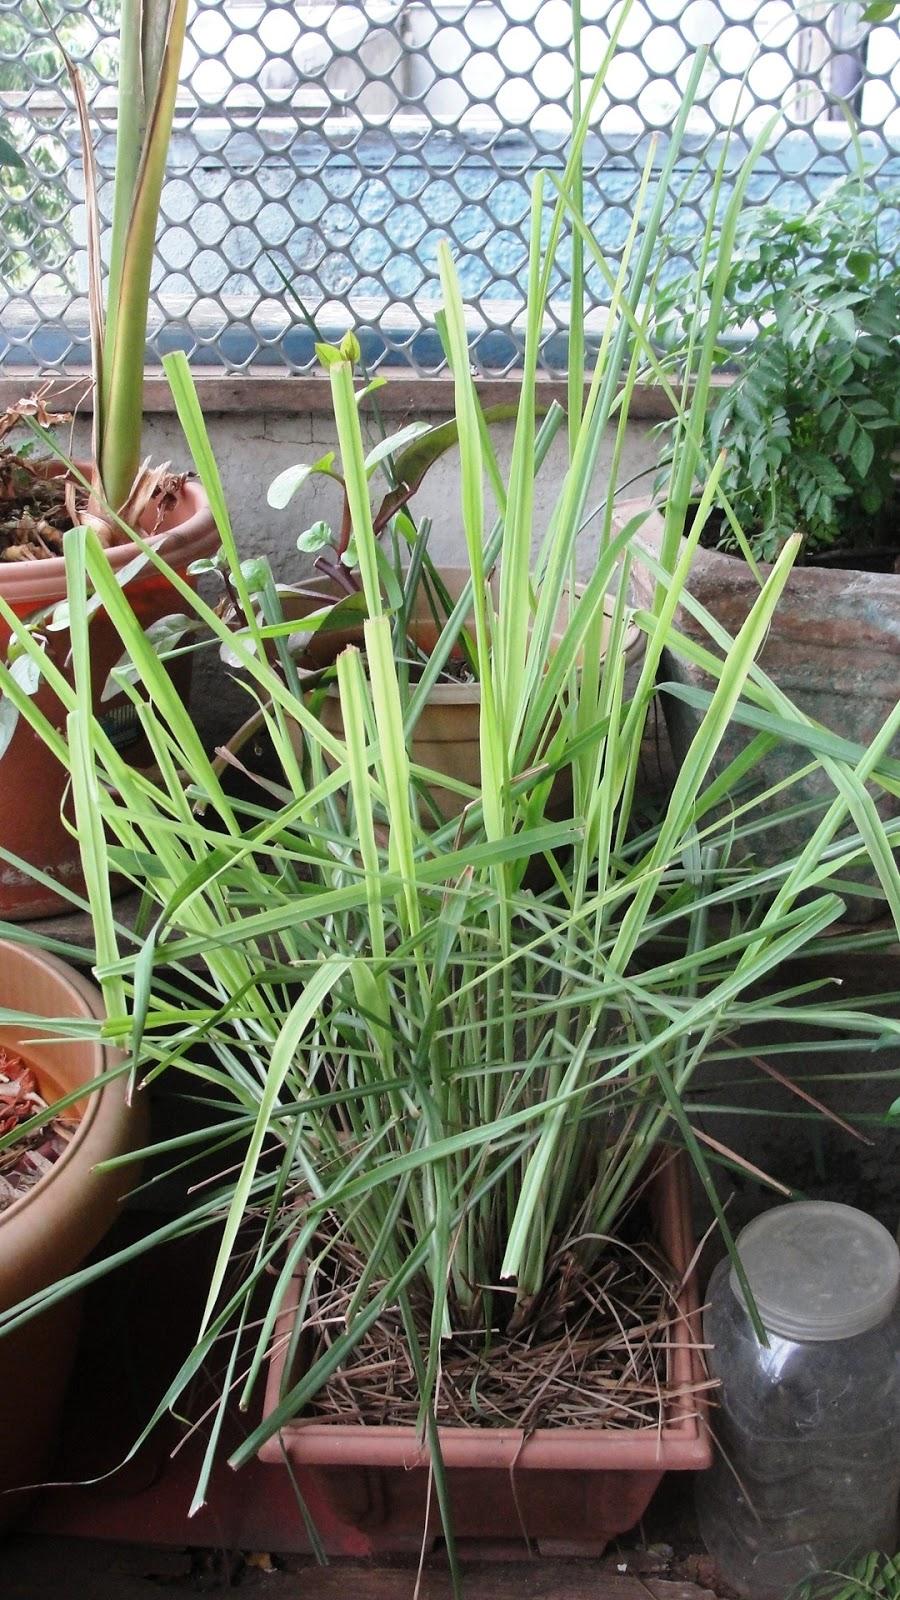 how to grow grass on a balcony